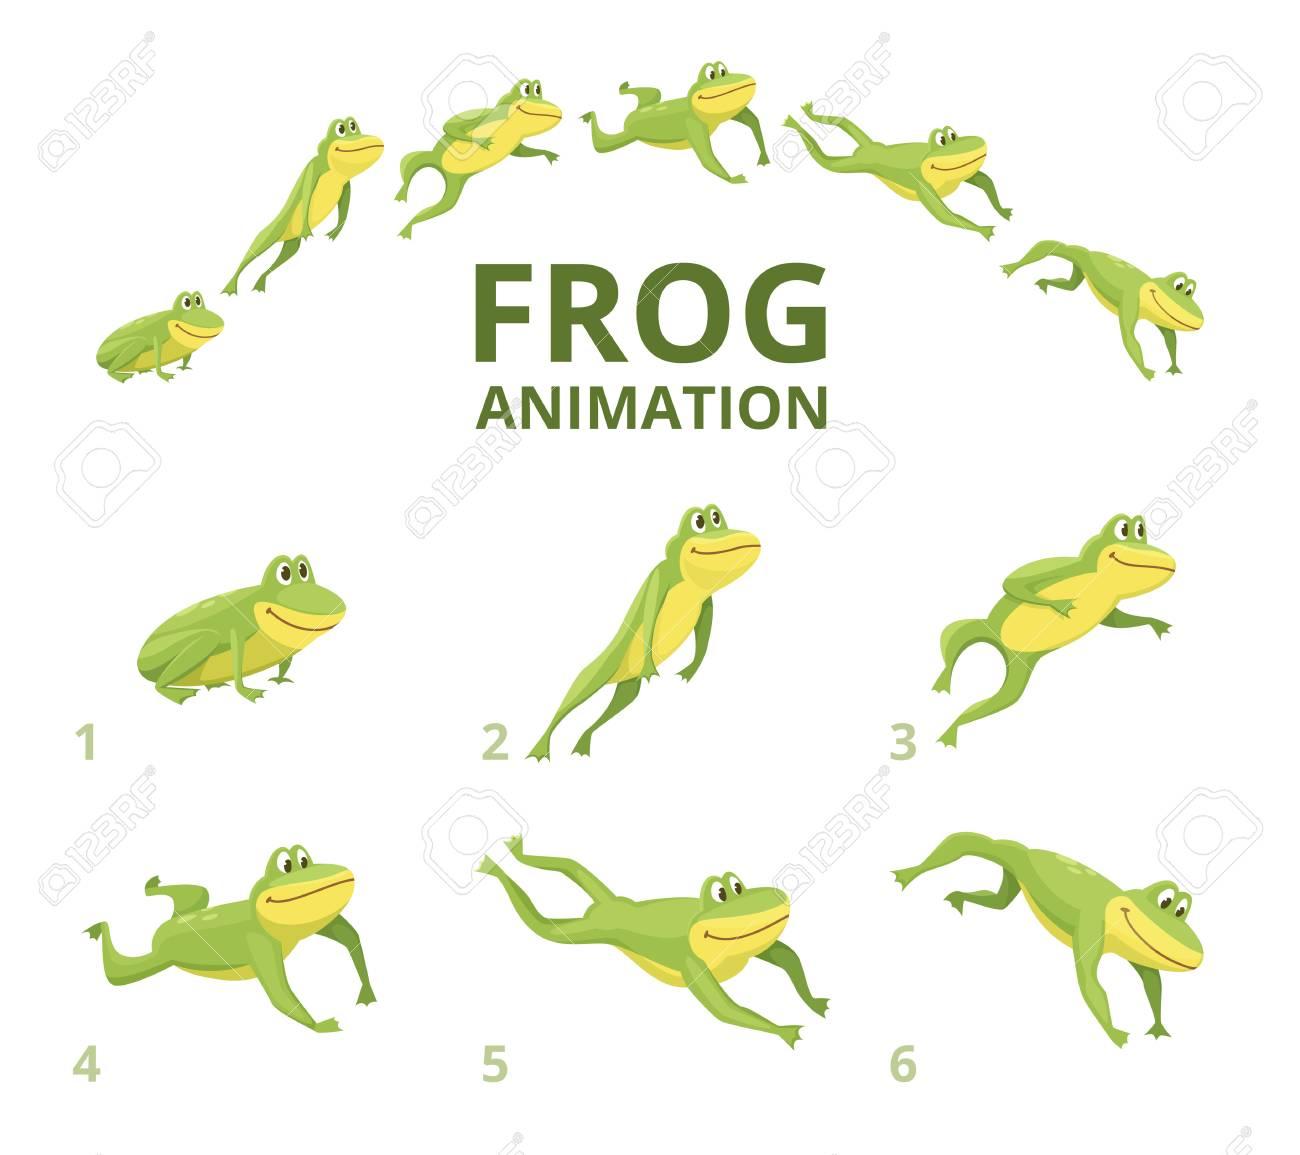 Frog jumping animation. Various keyframes for green animal. Vector frog animation, jump amphibian animated illustration - 110259216